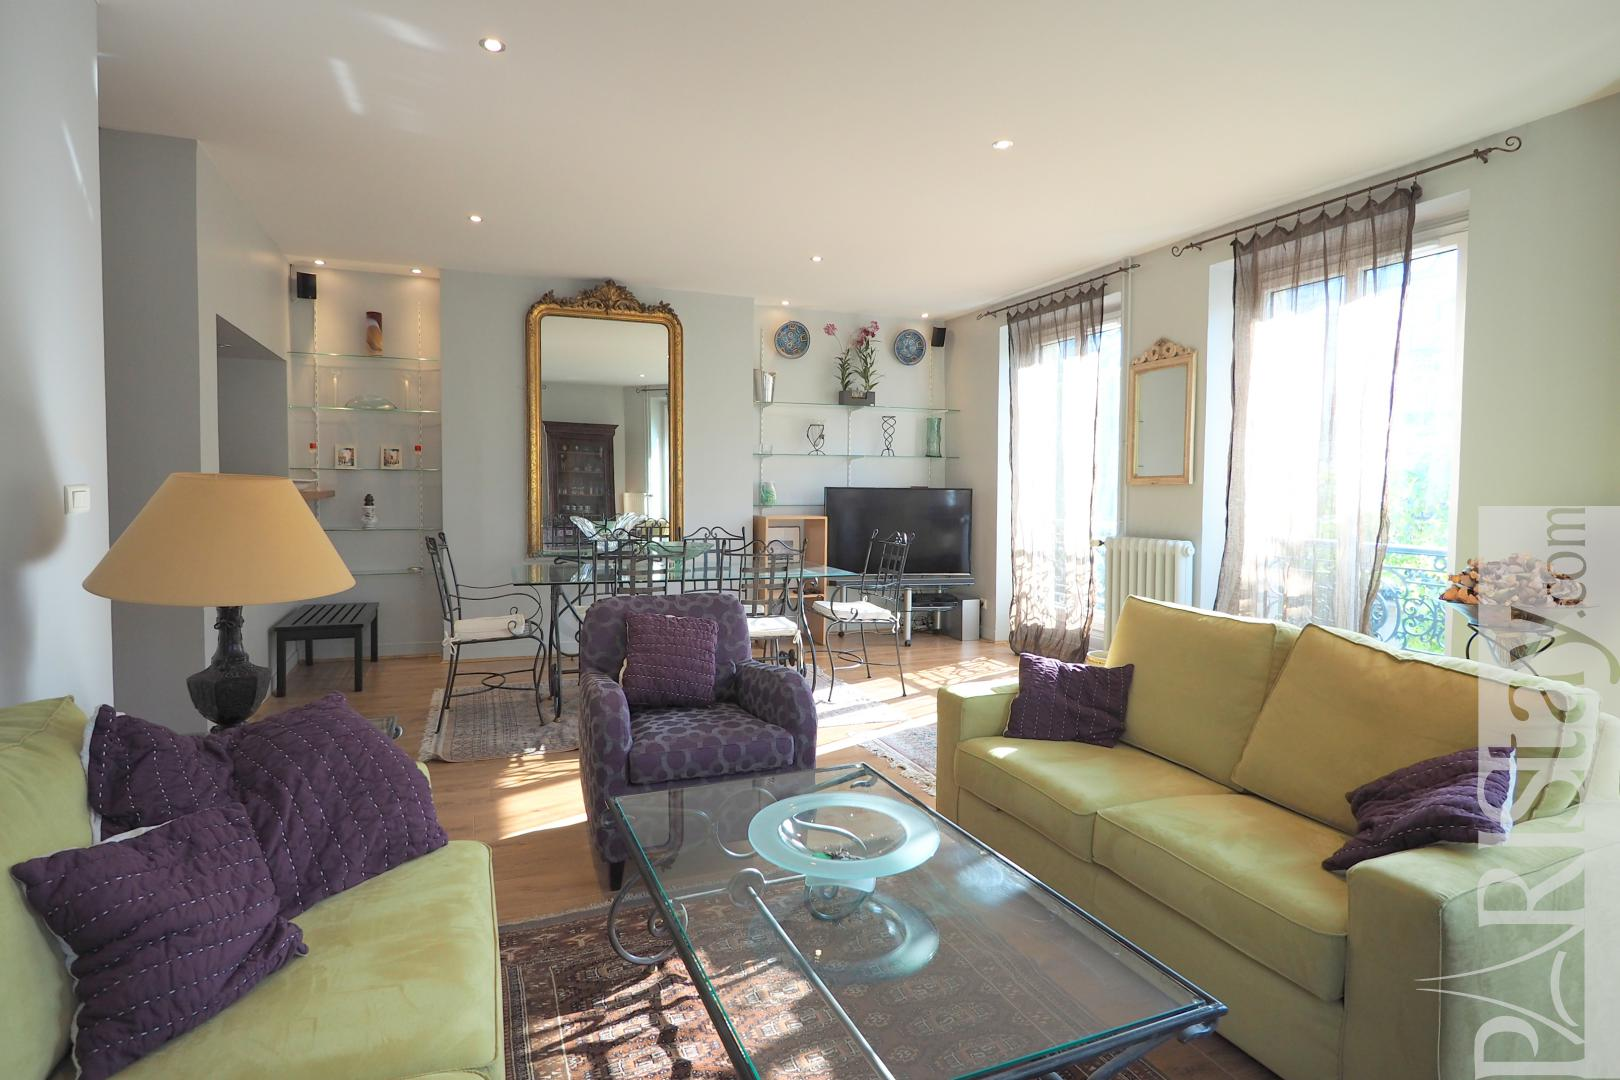 2 Bedrooms Apartment Long Term Rentals Paris Les Halles 75001 Paris